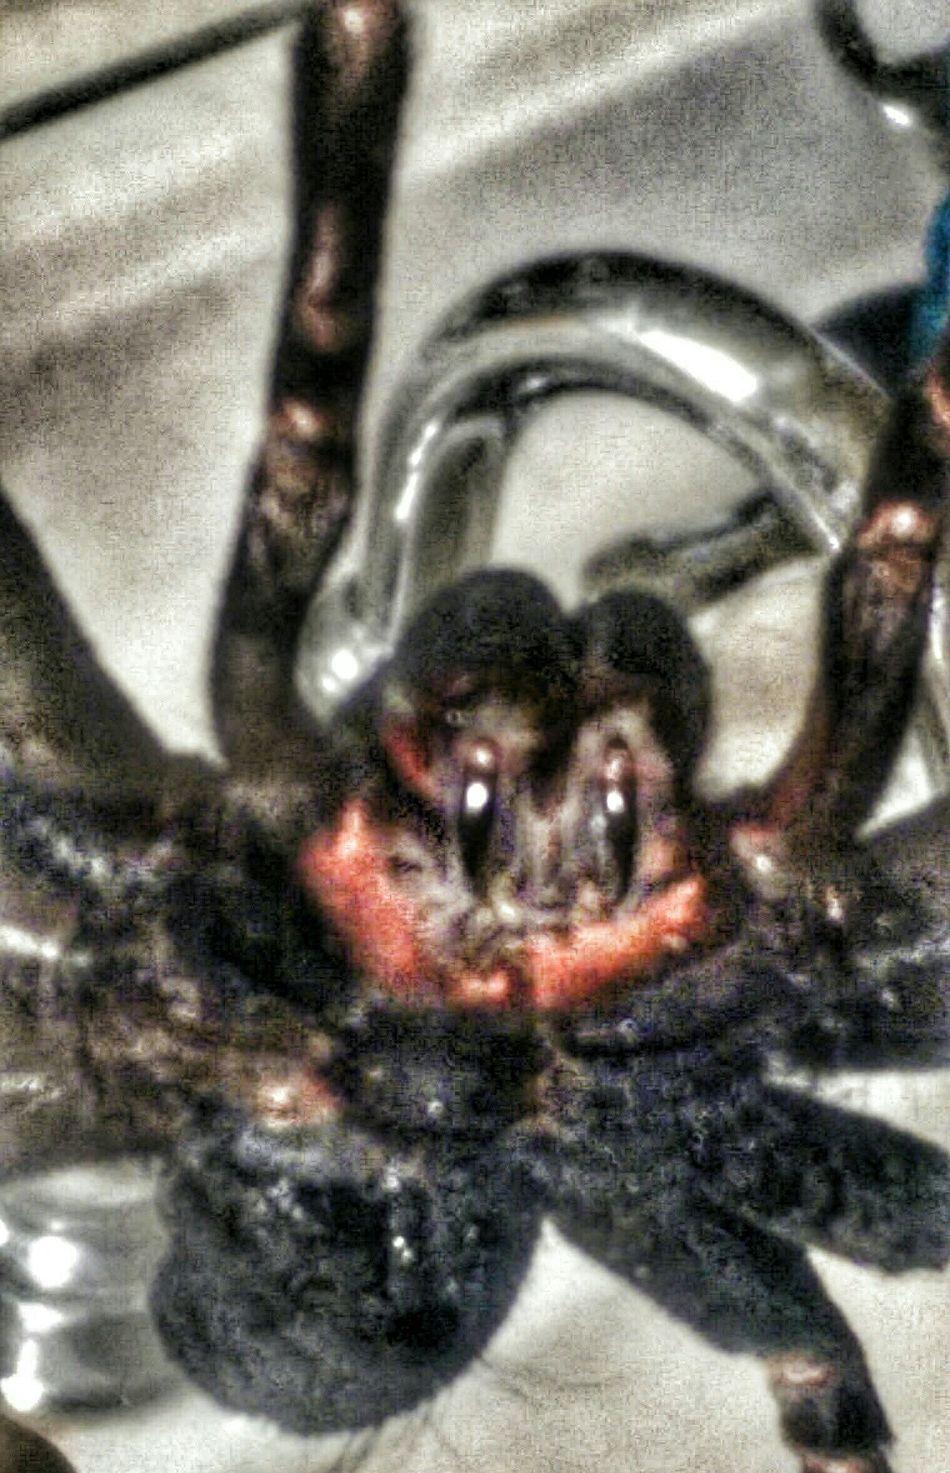 Attack Of The Macro Collection! Arachnipocalypse The Impurist EyeEm Animal Lover Tarantula Dead Things ArachnophobiaArachni-therapy https://youtu.be/VSnTkGqAT9M Happy Halloween